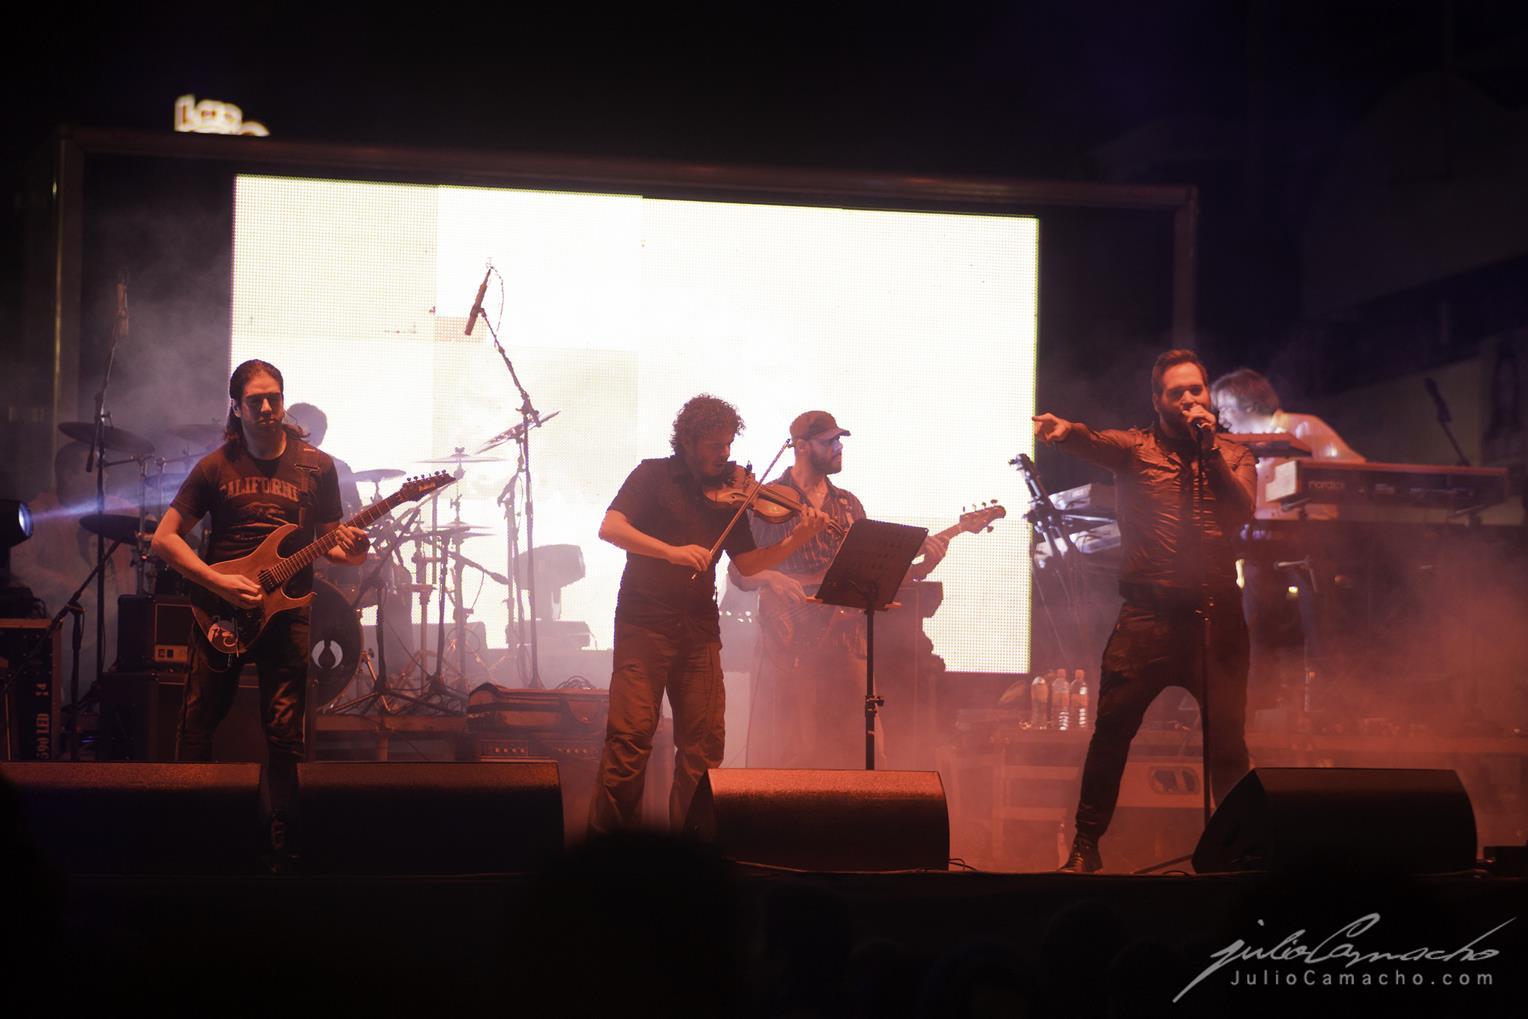 2014-10-30 31 CAST TOUR Ensenada y Tijuana - 1418 - www.Juli (Copy).jpg